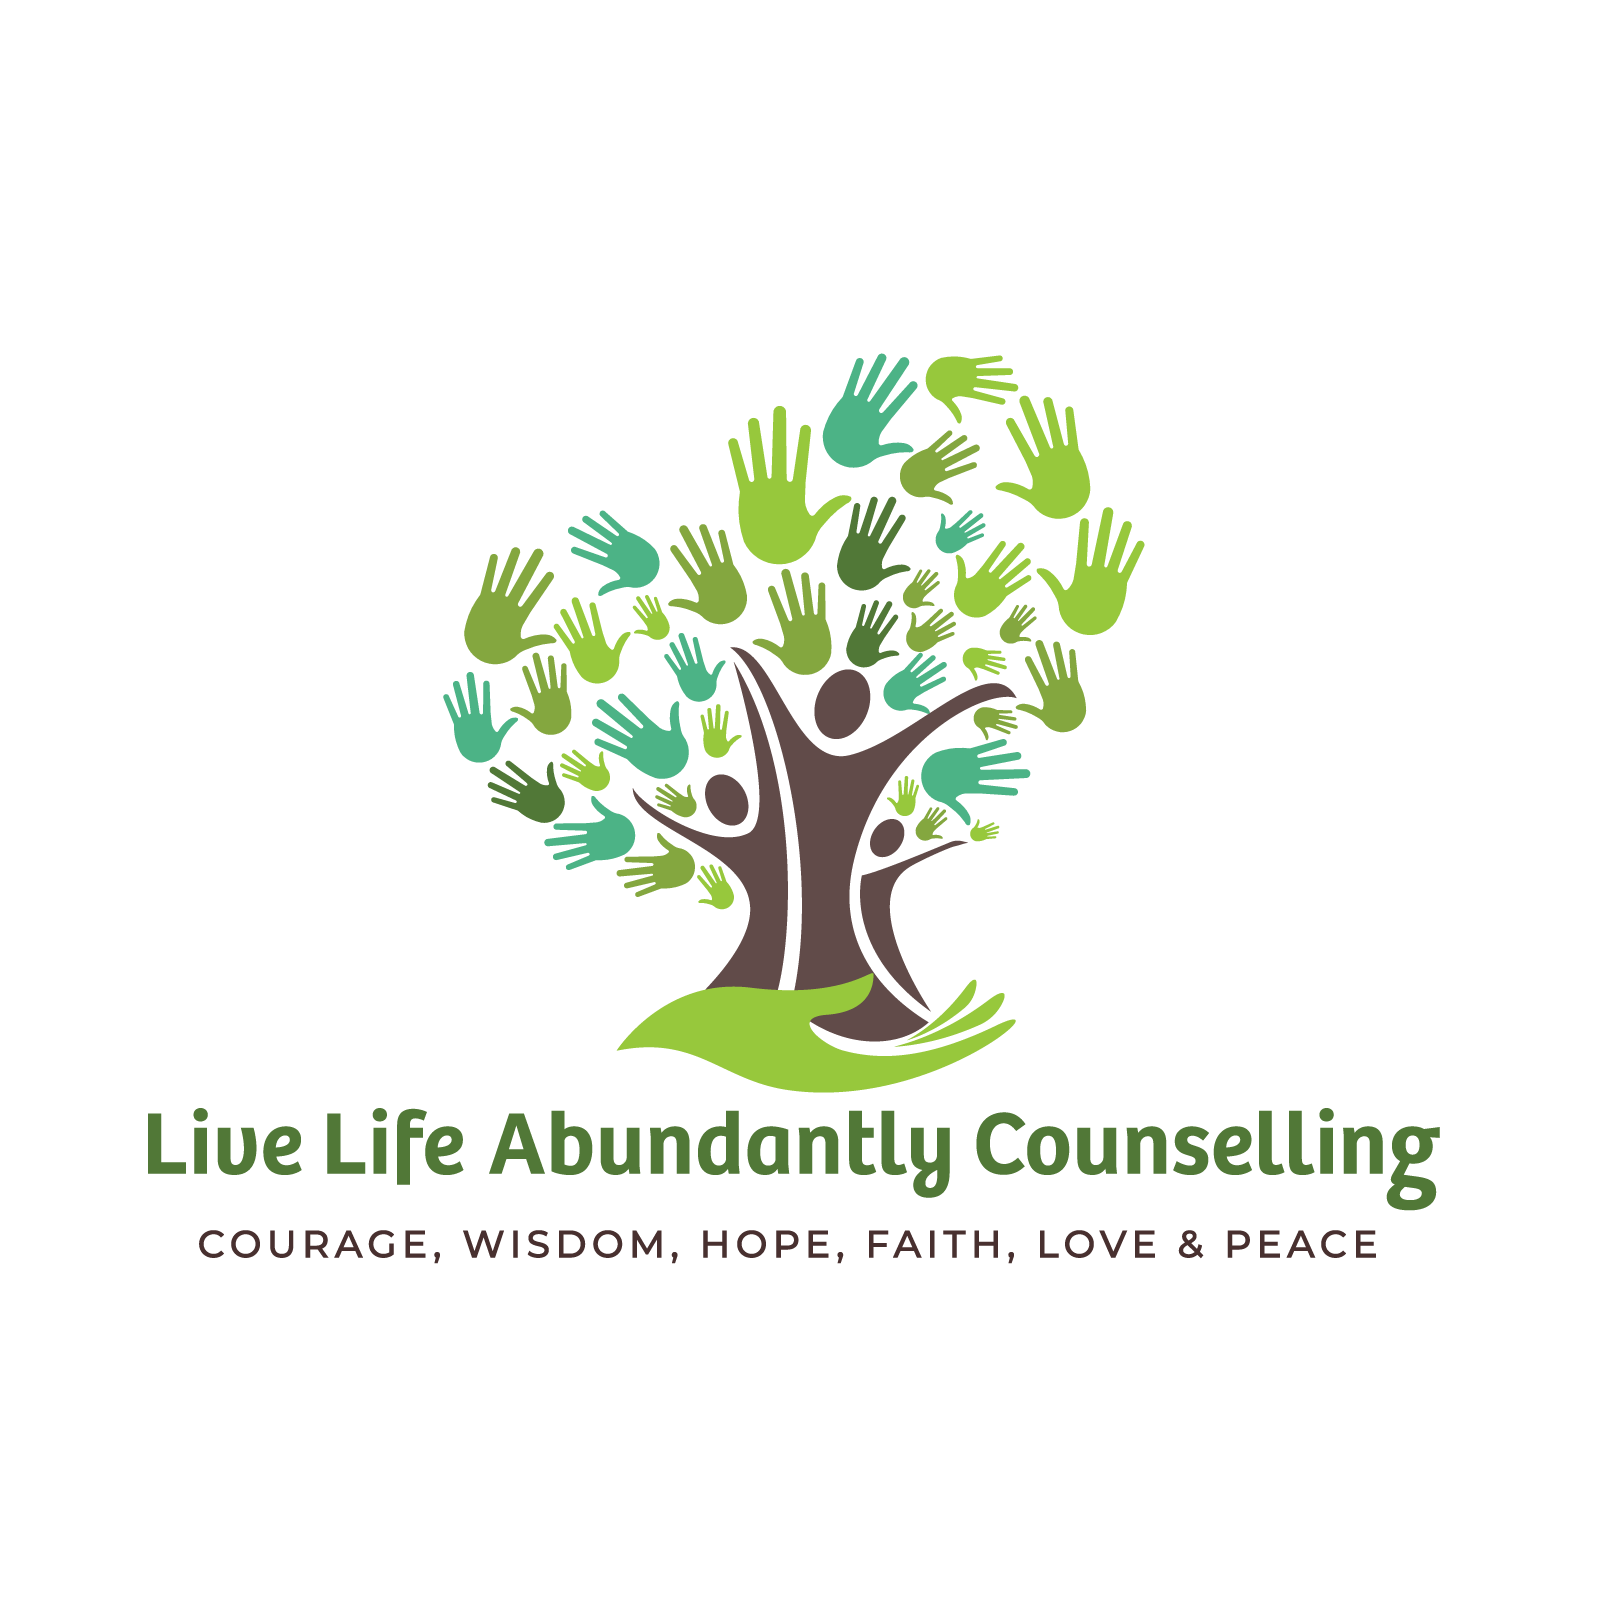 Live Life Abundantly Counselling